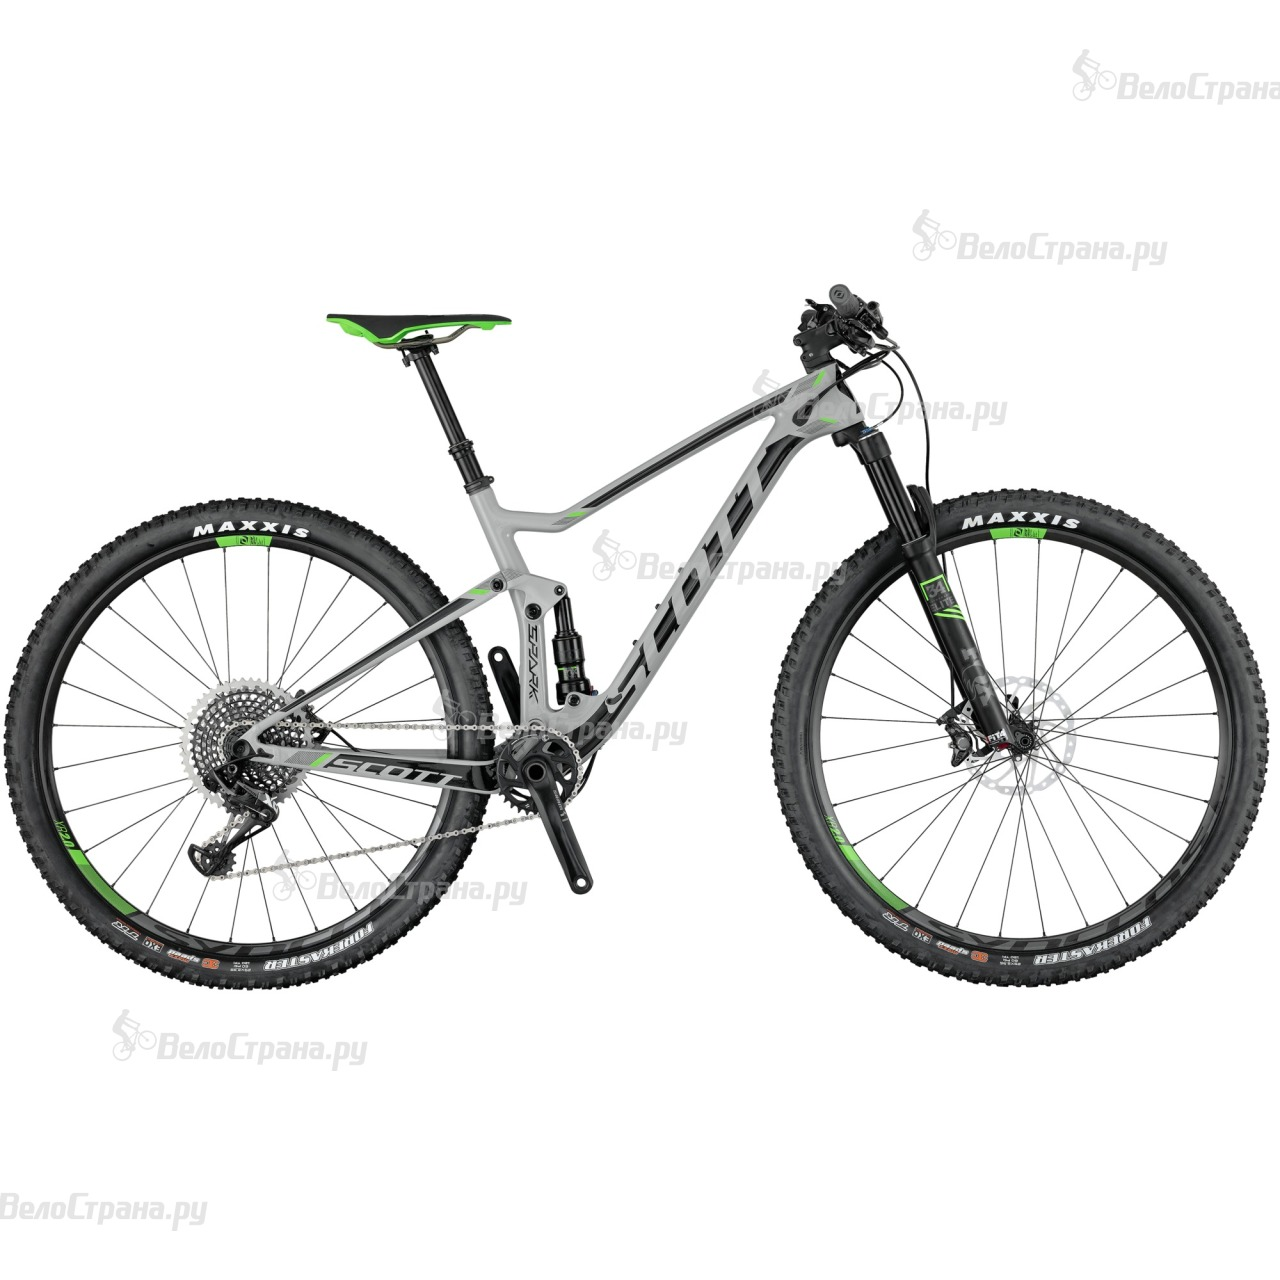 Велосипед Scott Spark 700 (2017) велосипед scott spark 700 premium 2015